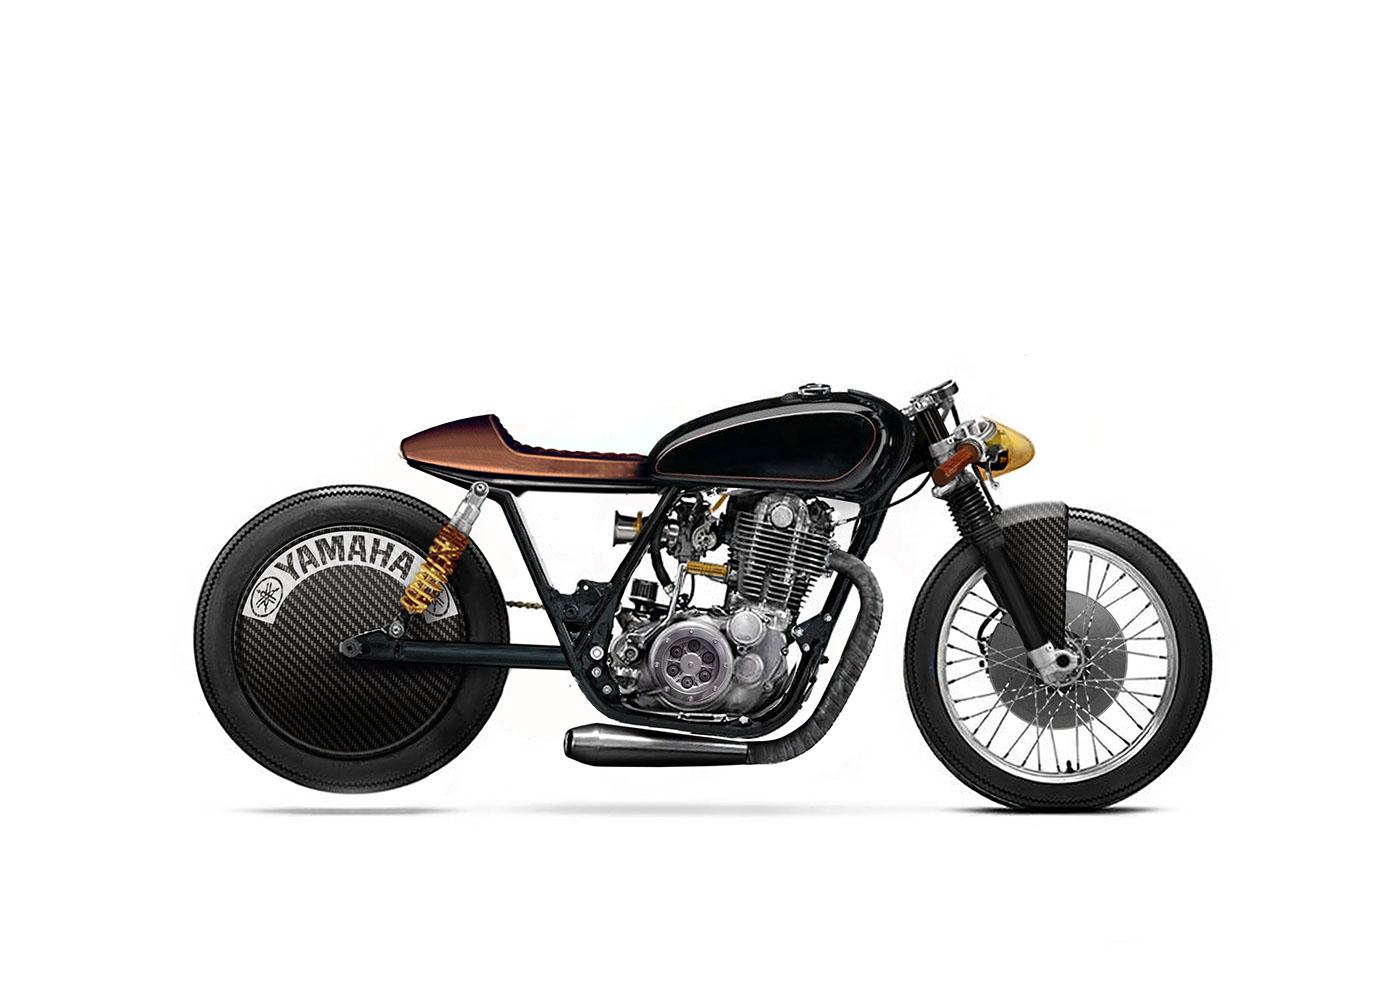 Yamaha Sr500 Cafe Racer 1 8 Mile Concept Motorcycle On Behance